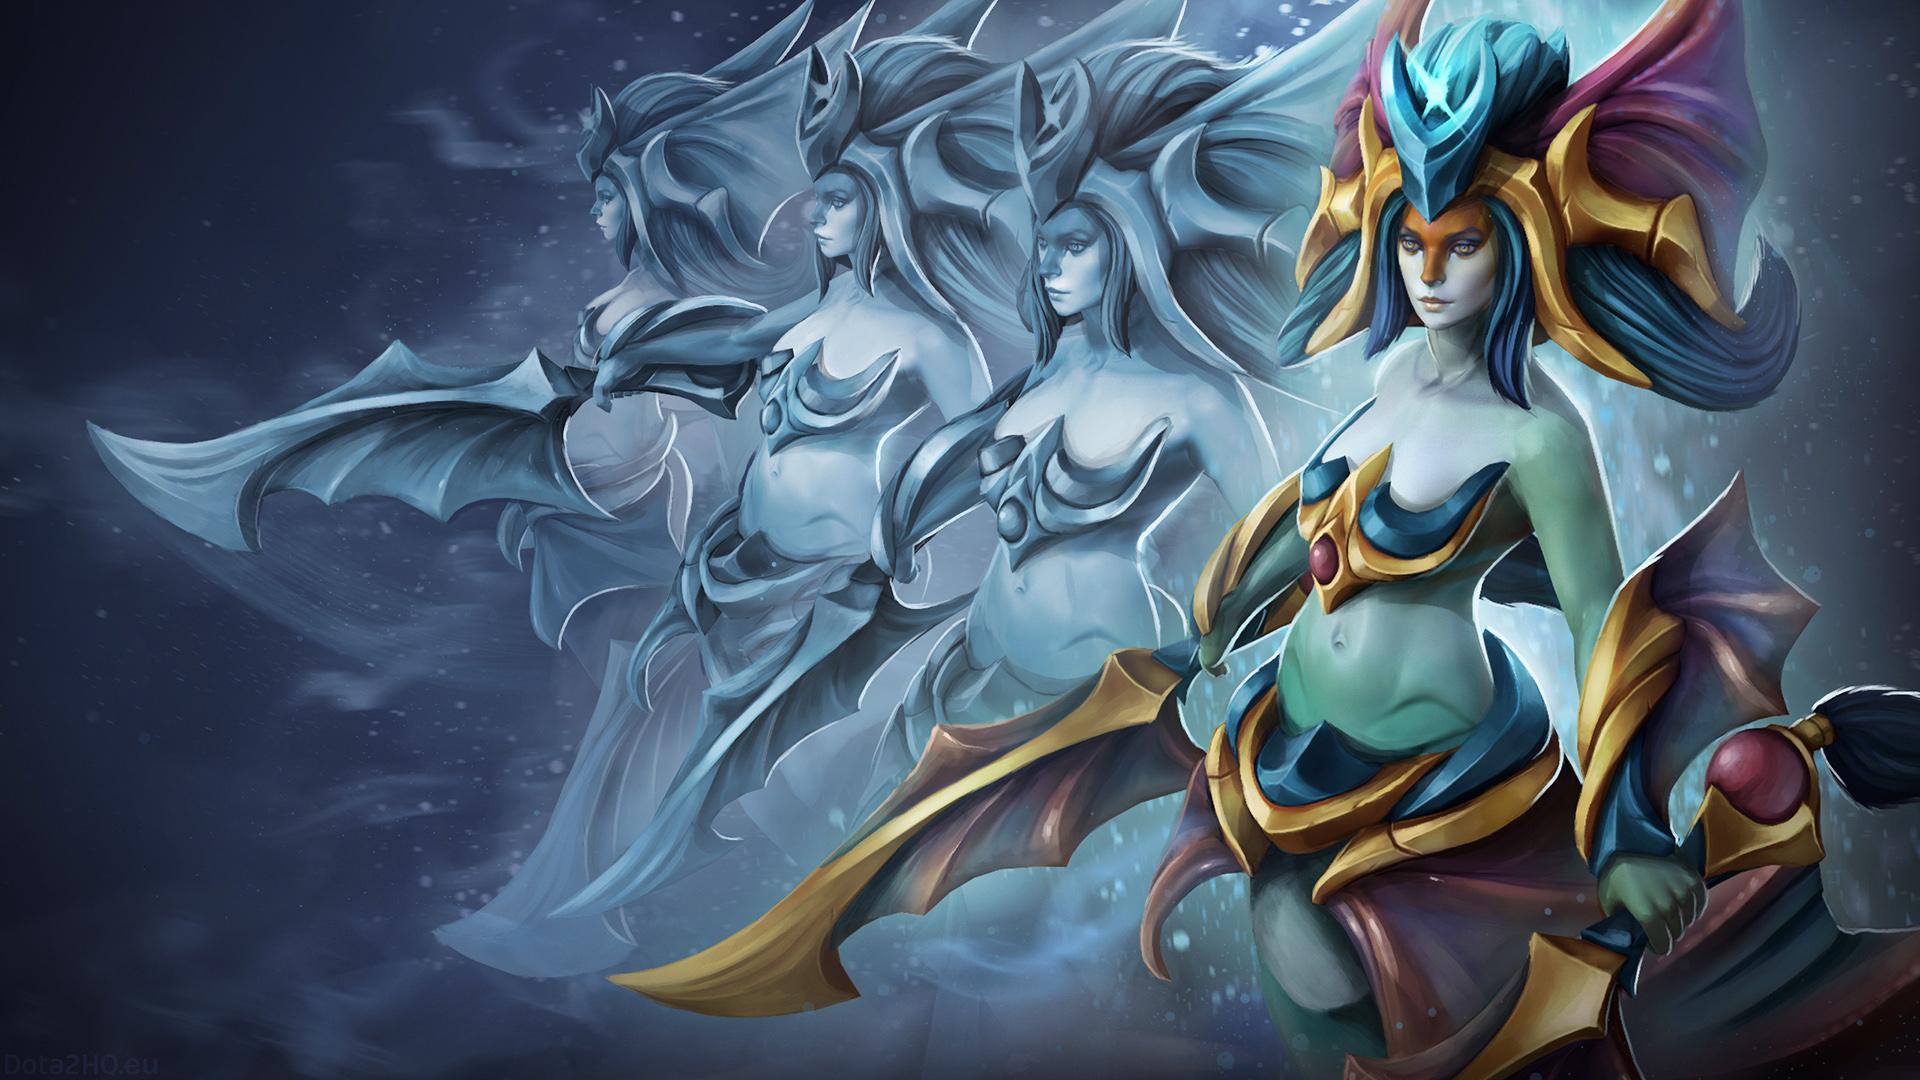 Naga Siren Empress Dota 2 Viewed Through A Prism Desktop - Naga Siren Dota 2 , HD Wallpaper & Backgrounds